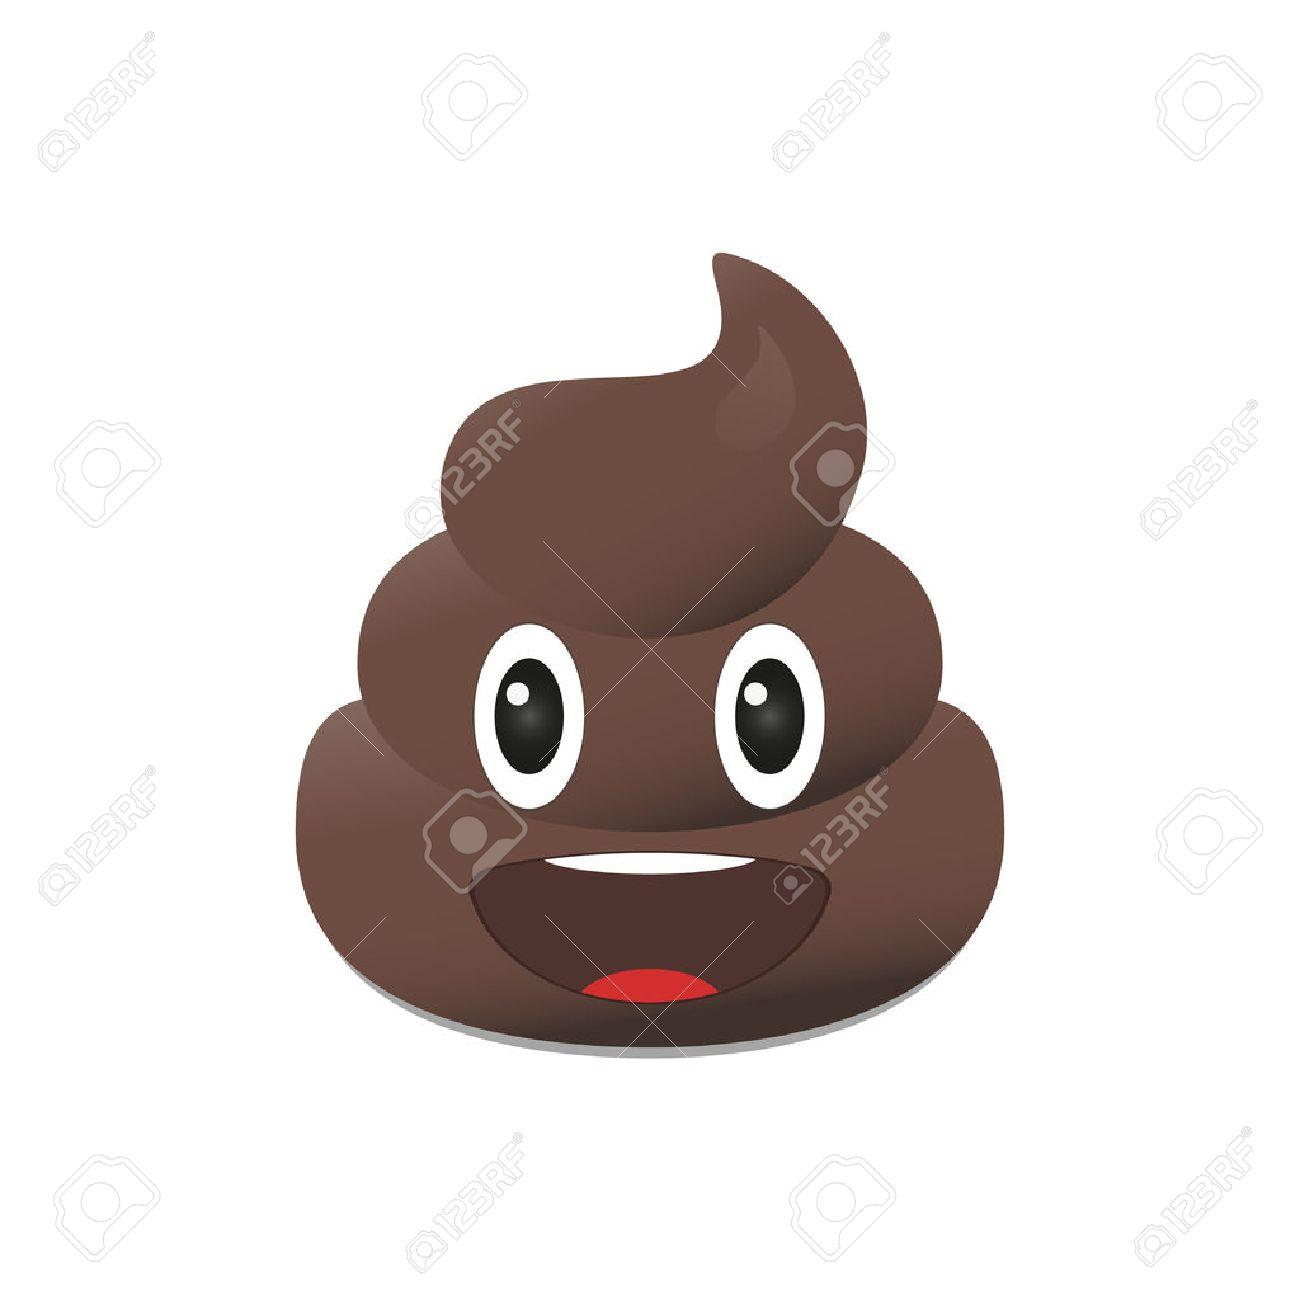 66696651-shit-emoji-poo-emoticon-poop-em